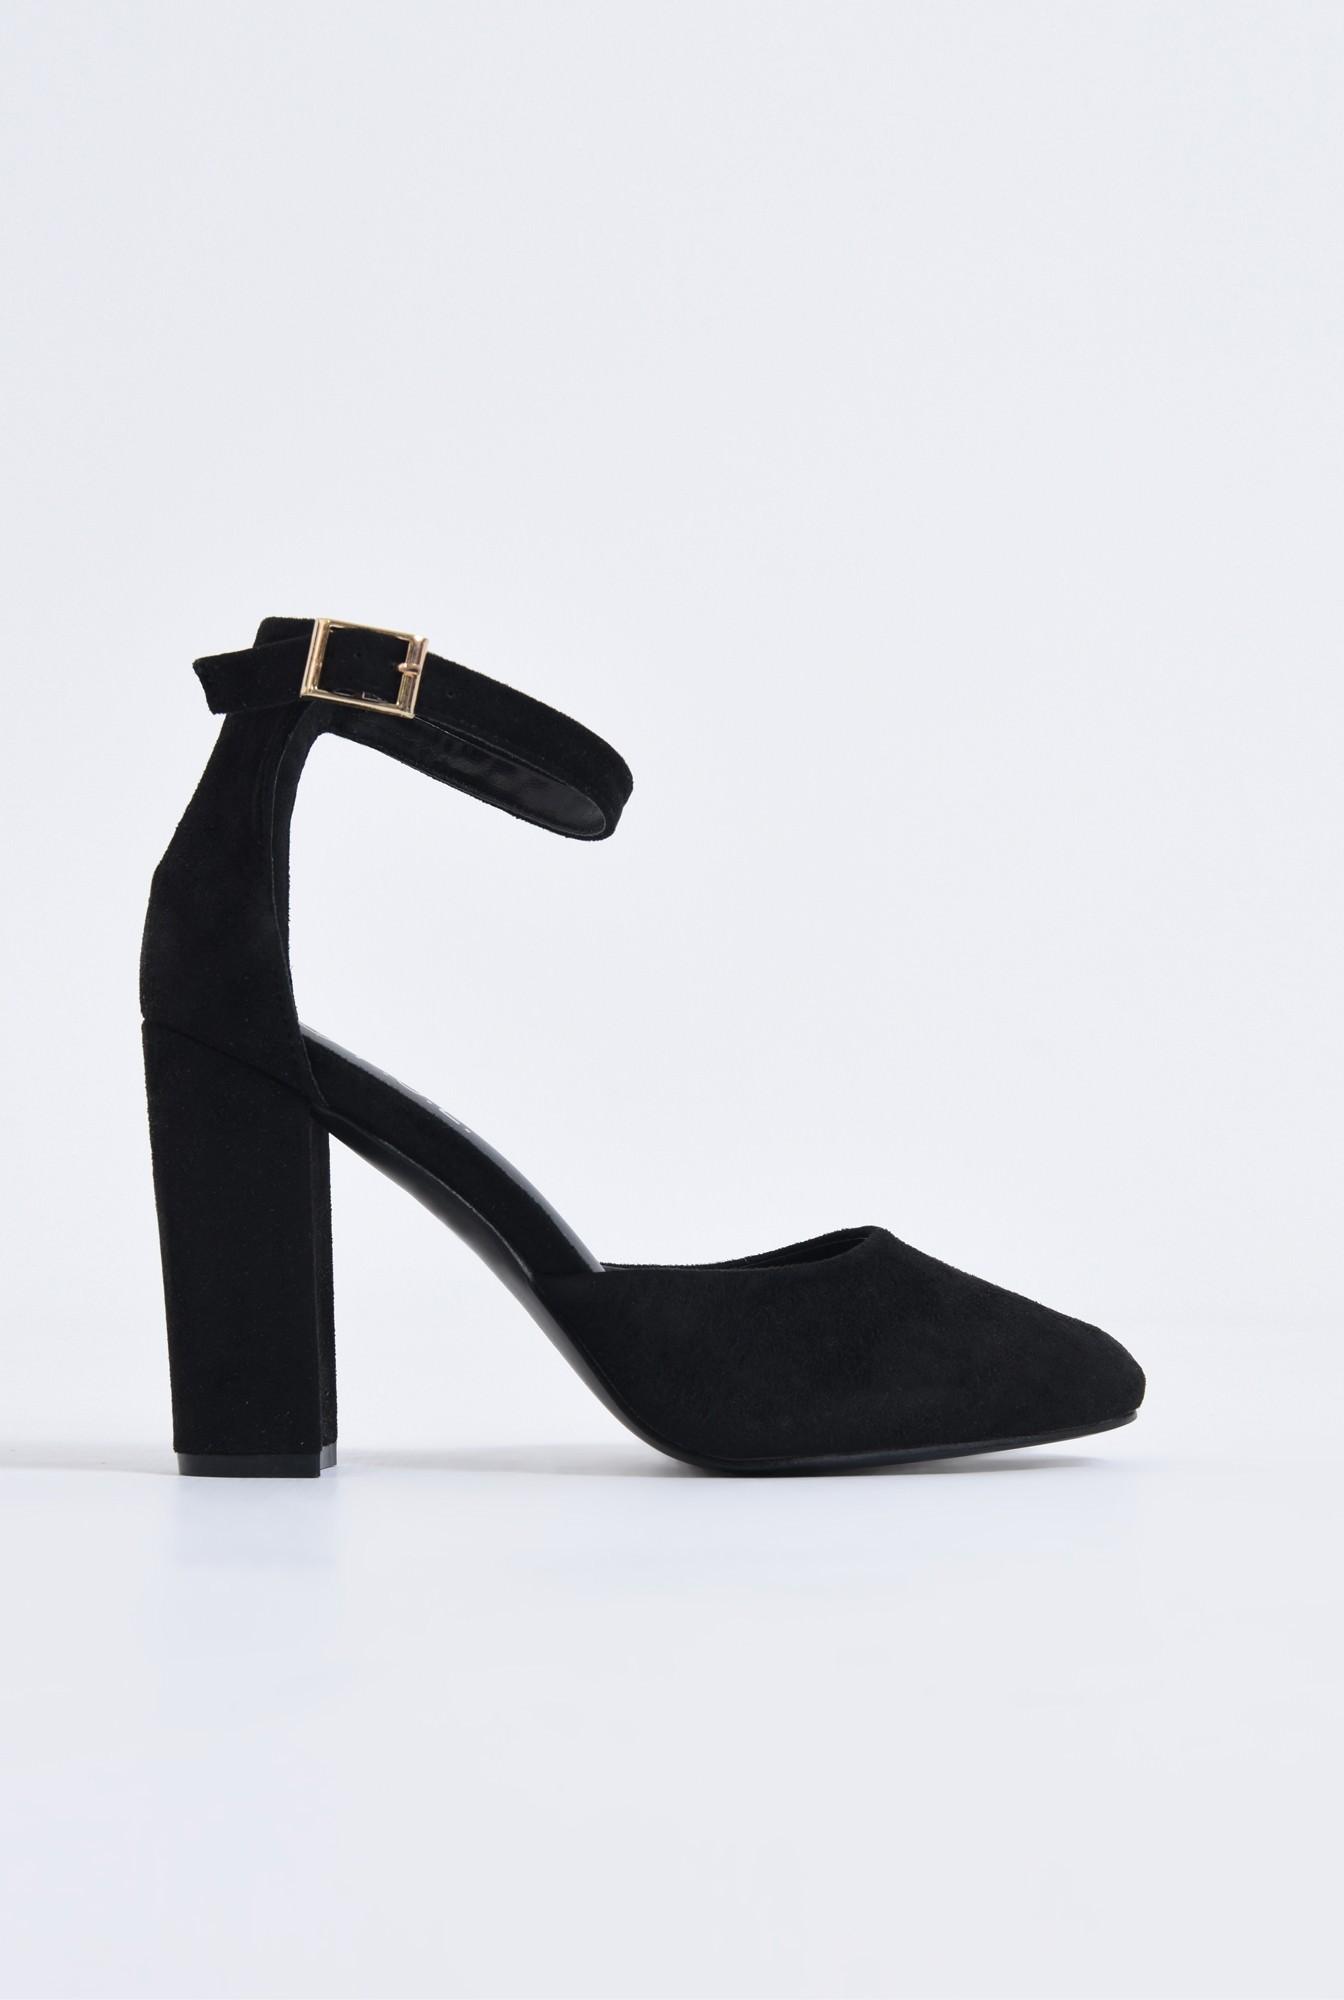 0 - pantofi casual, negri, toc gros